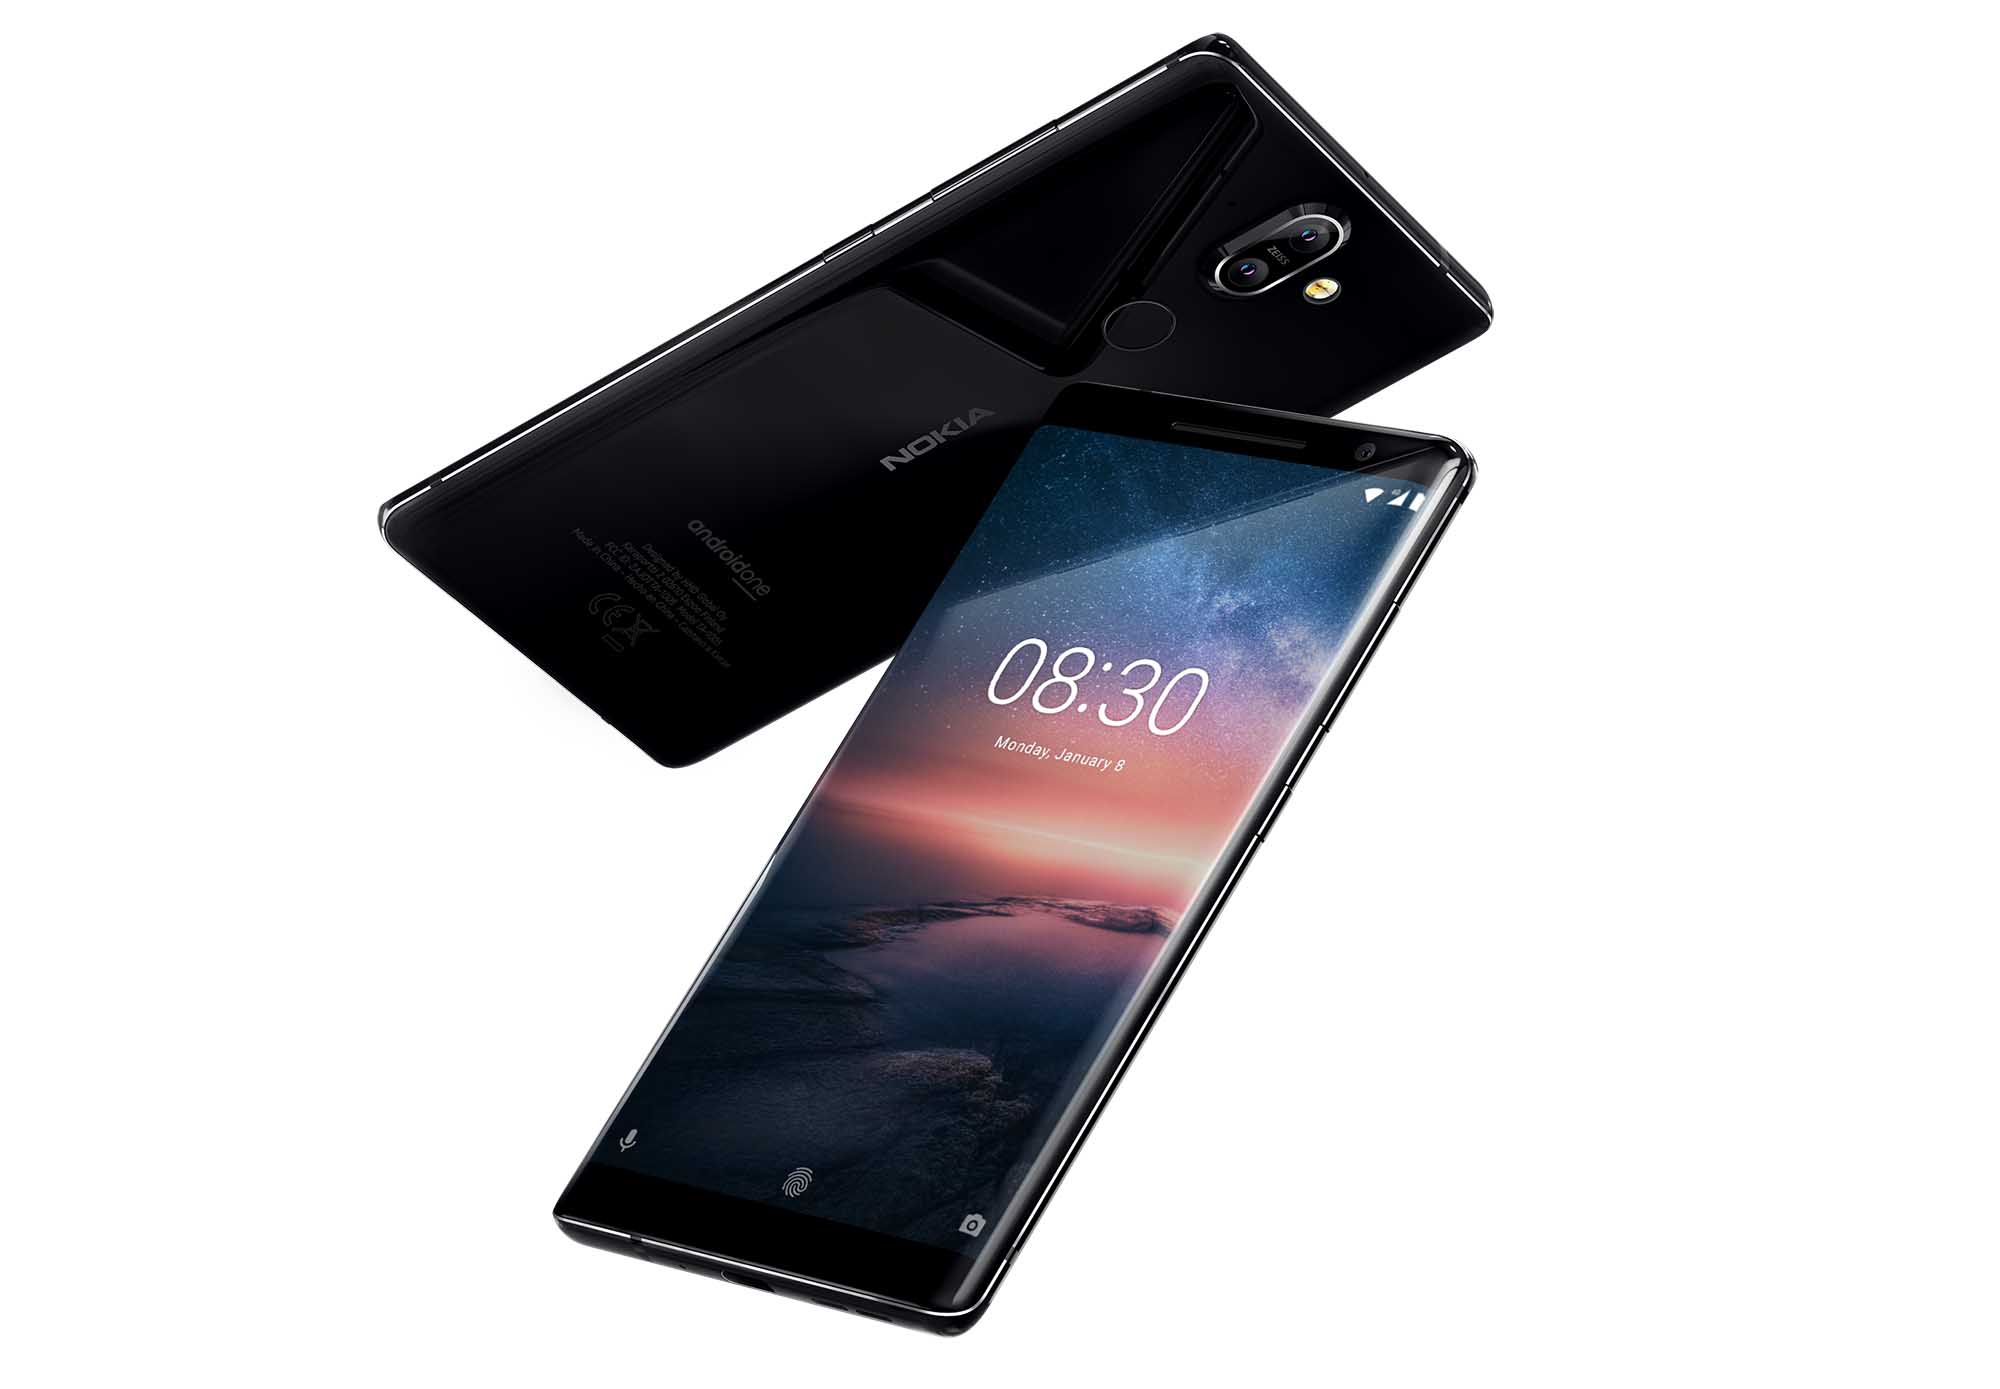 Nokia 8 Sirocco 強化版推出  新增 Qi 無線充電賣 HK$5,288